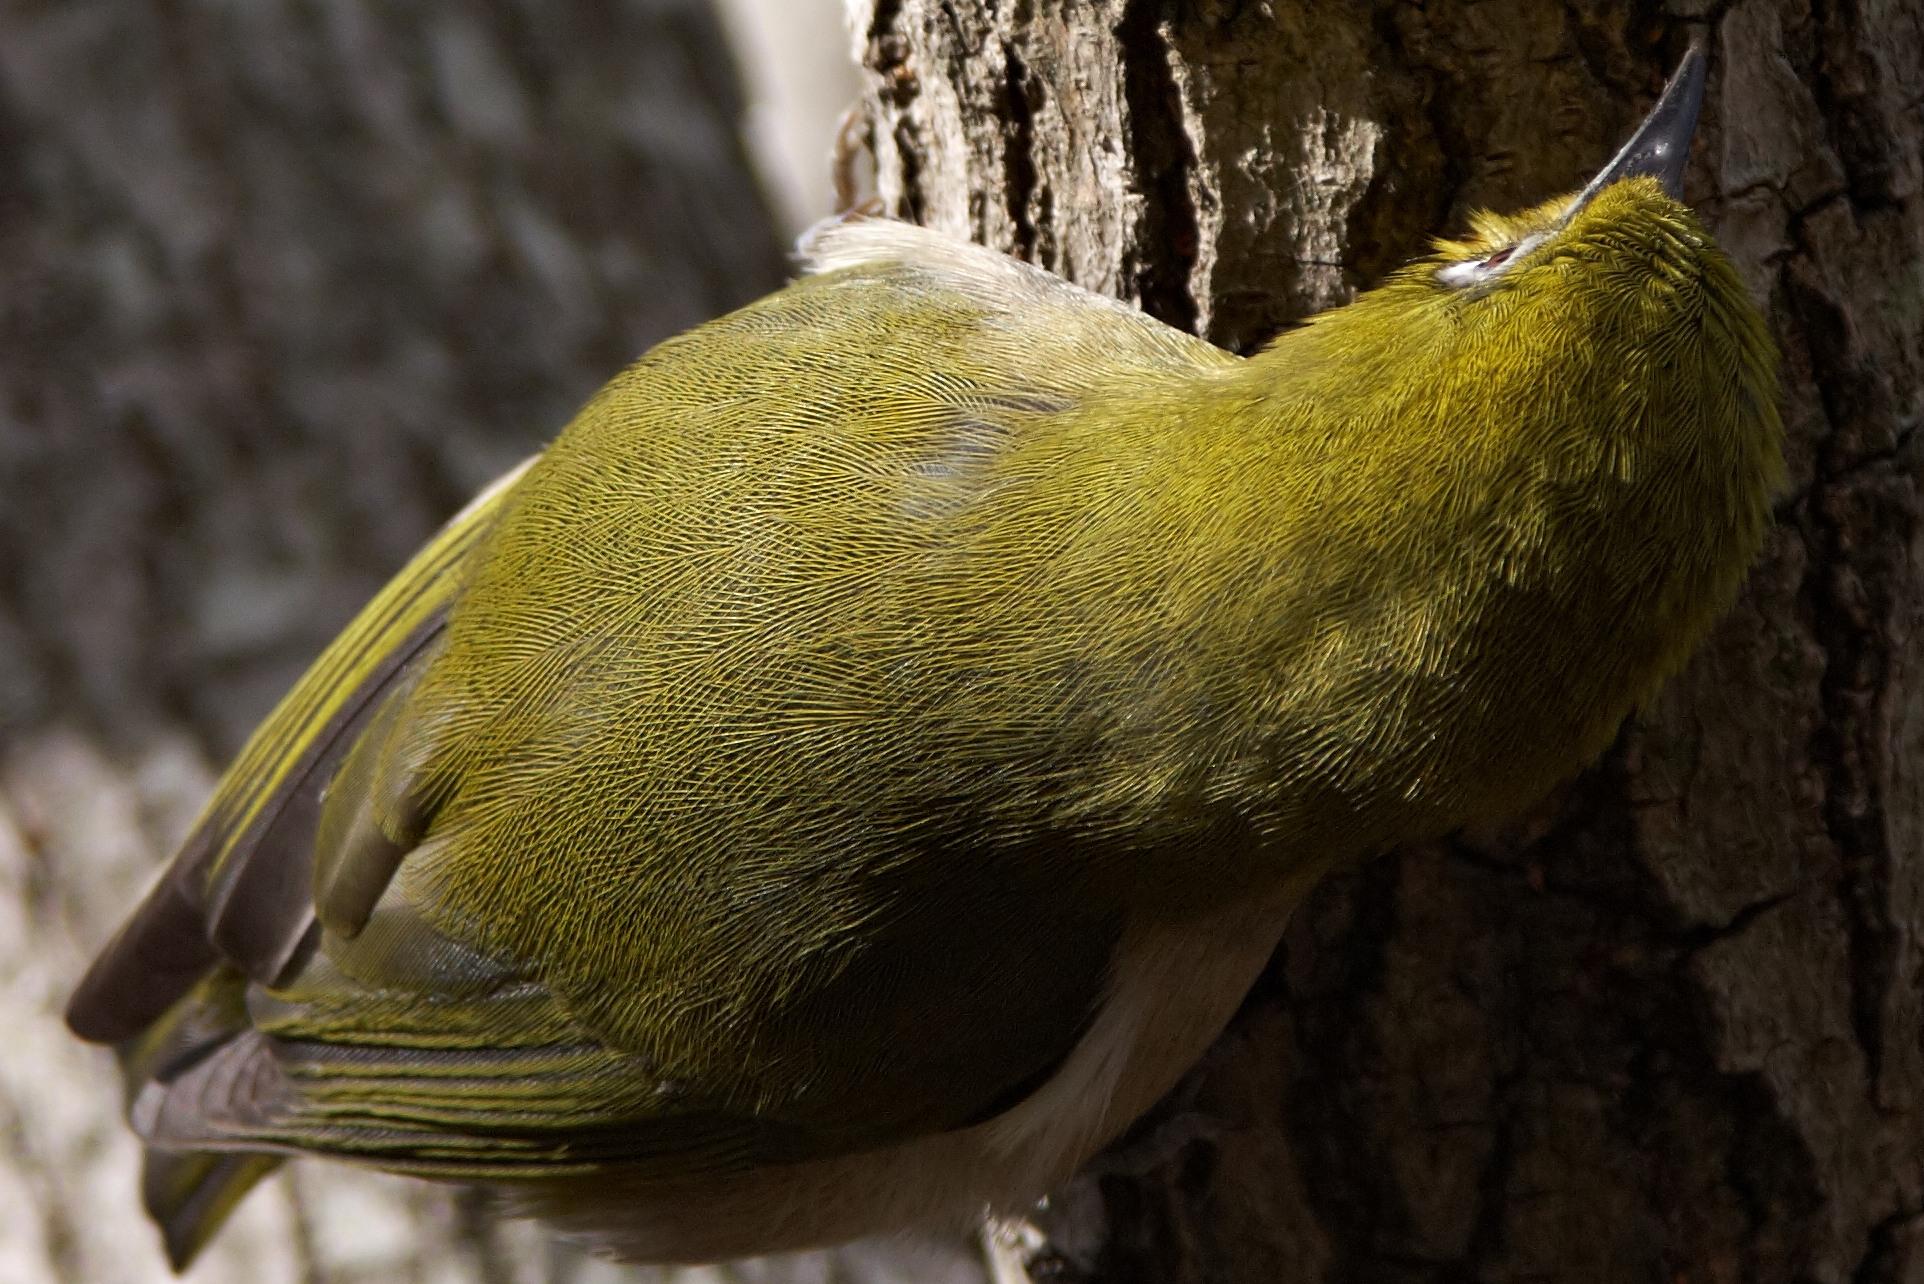 AFボーグ BORG60EDで撮影した野鳥・メジロの写真画像